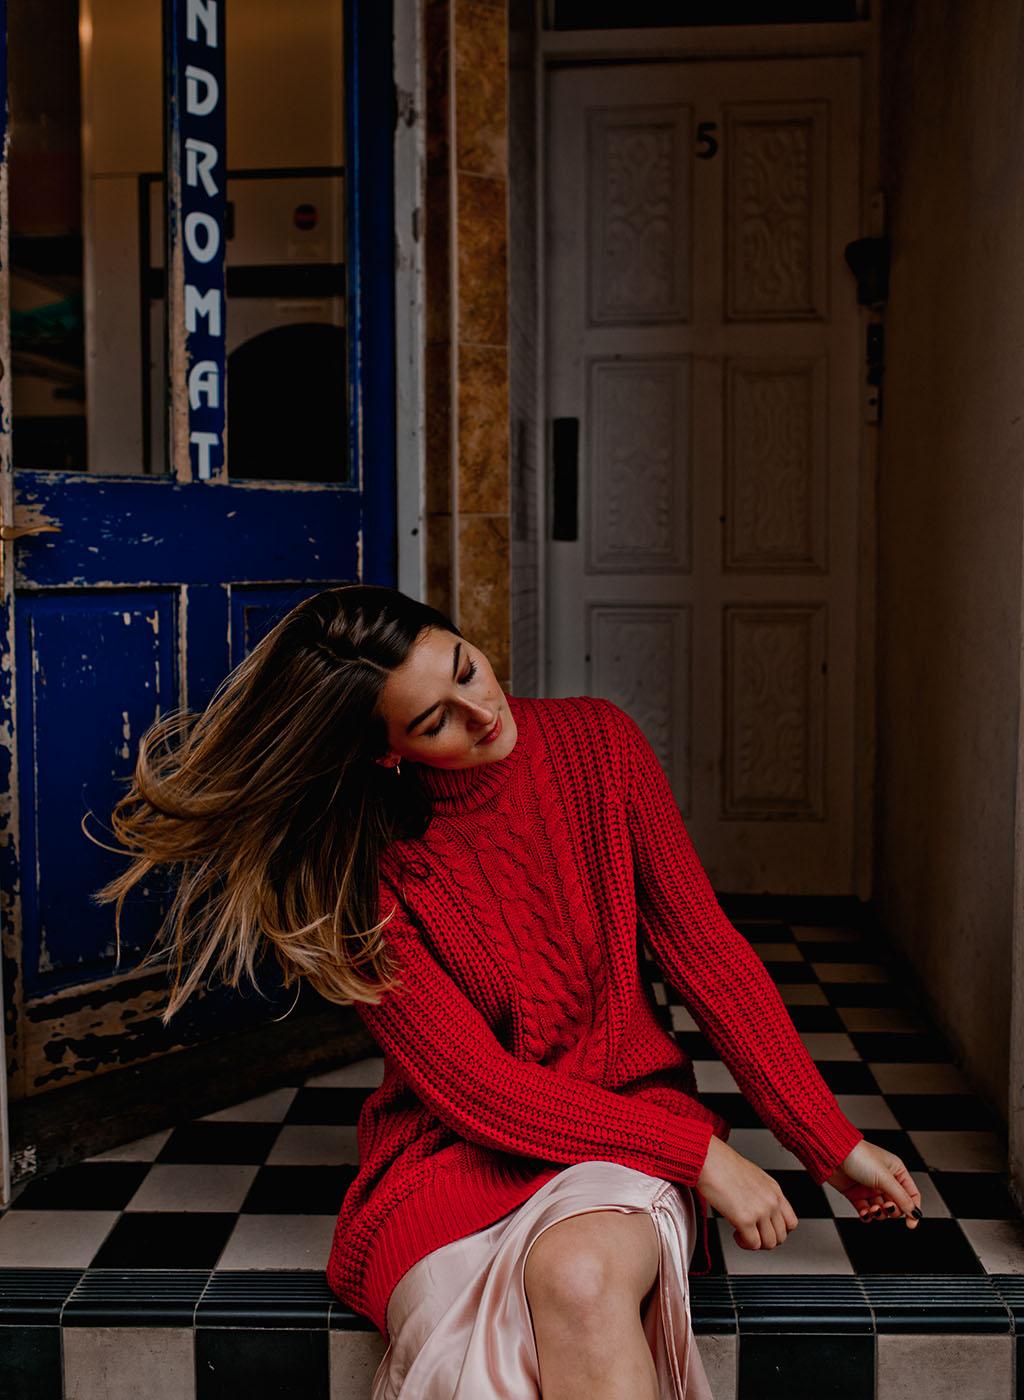 Matalan red jumper knitwear autumn winter style